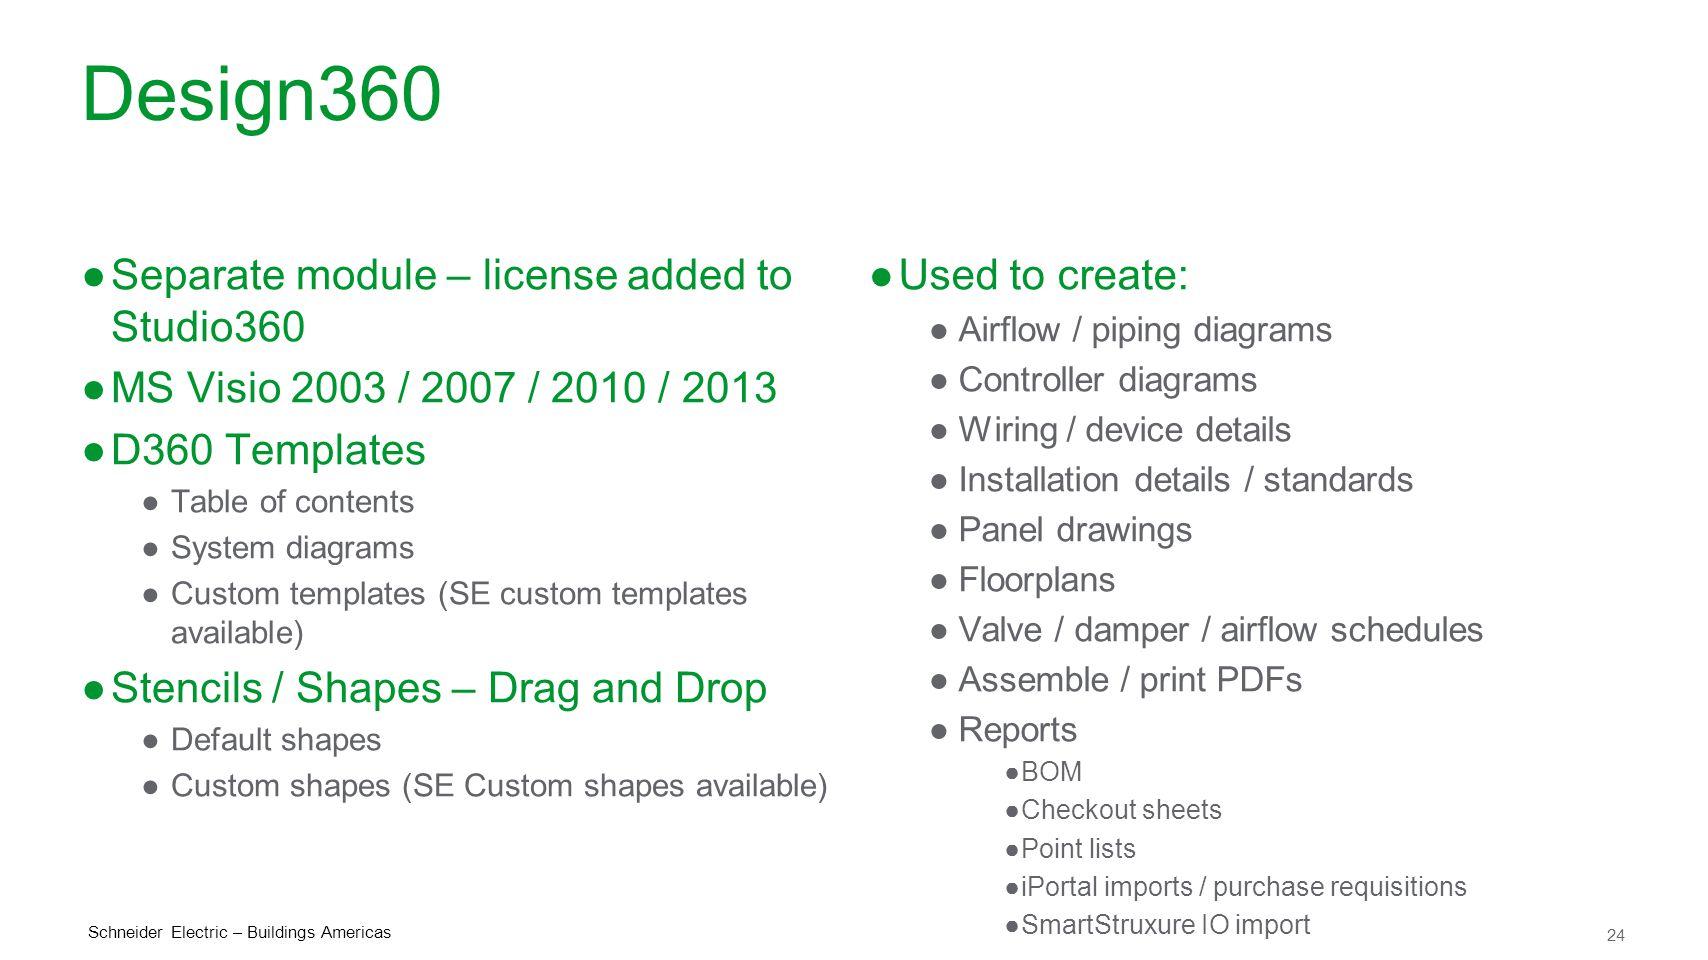 24 Schneider Electric – Buildings Americas Design360 ●Separate module – license added to Studio360 ●MS Visio 2003 / 2007 / 2010 / 2013 ●D360 Templates